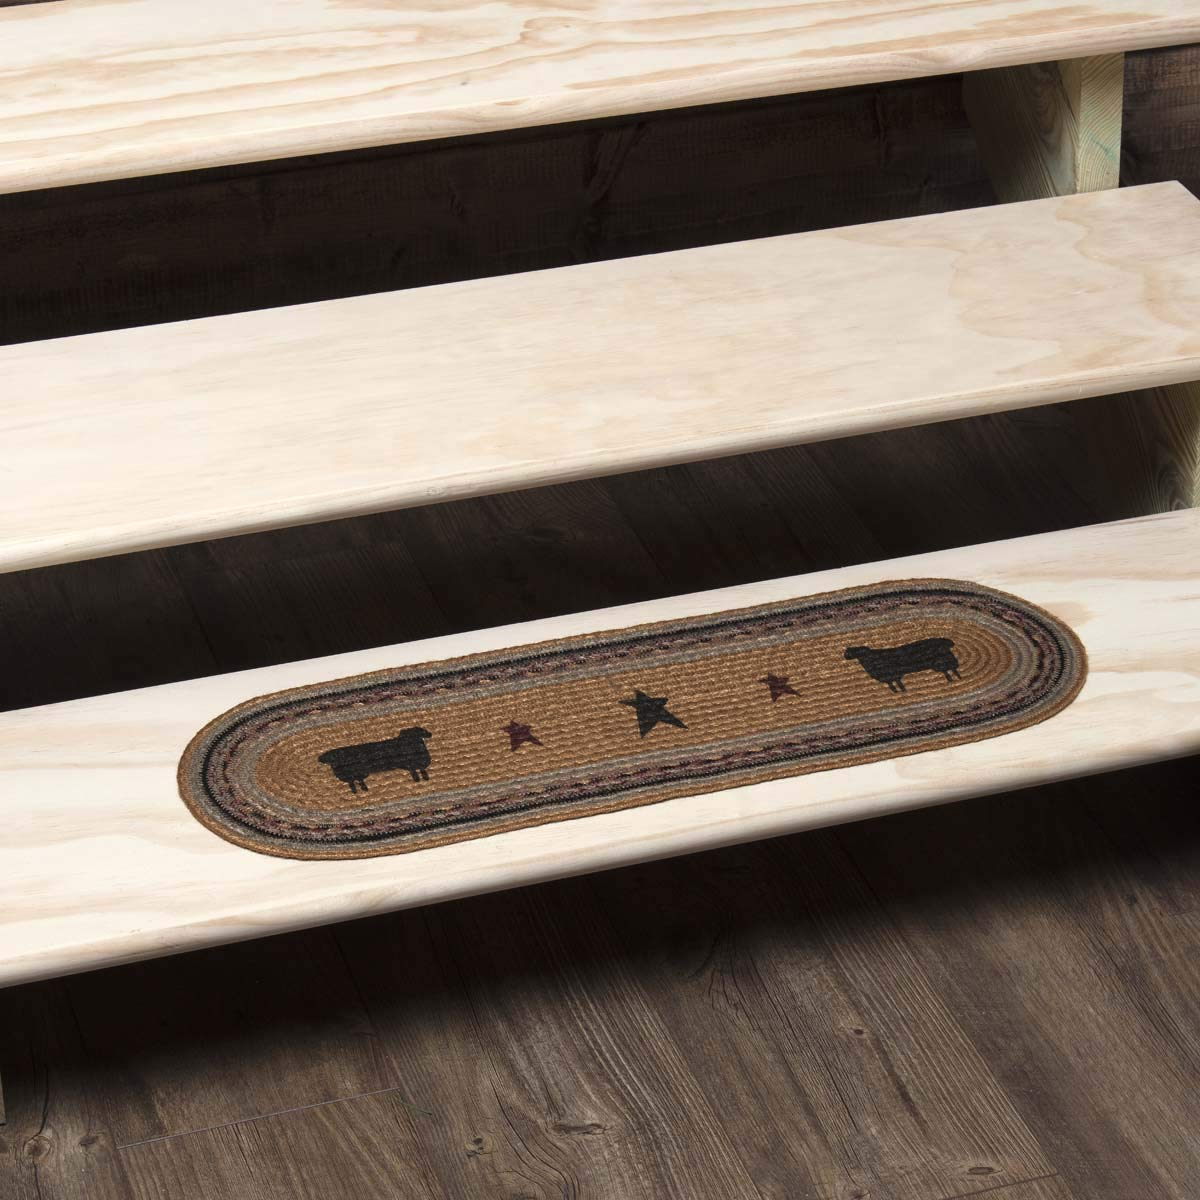 Stair Tread Mustard Yellow VHC Brands 34044 Primitive Flooring-Heritage Farms Tan Sheep Oval Jute